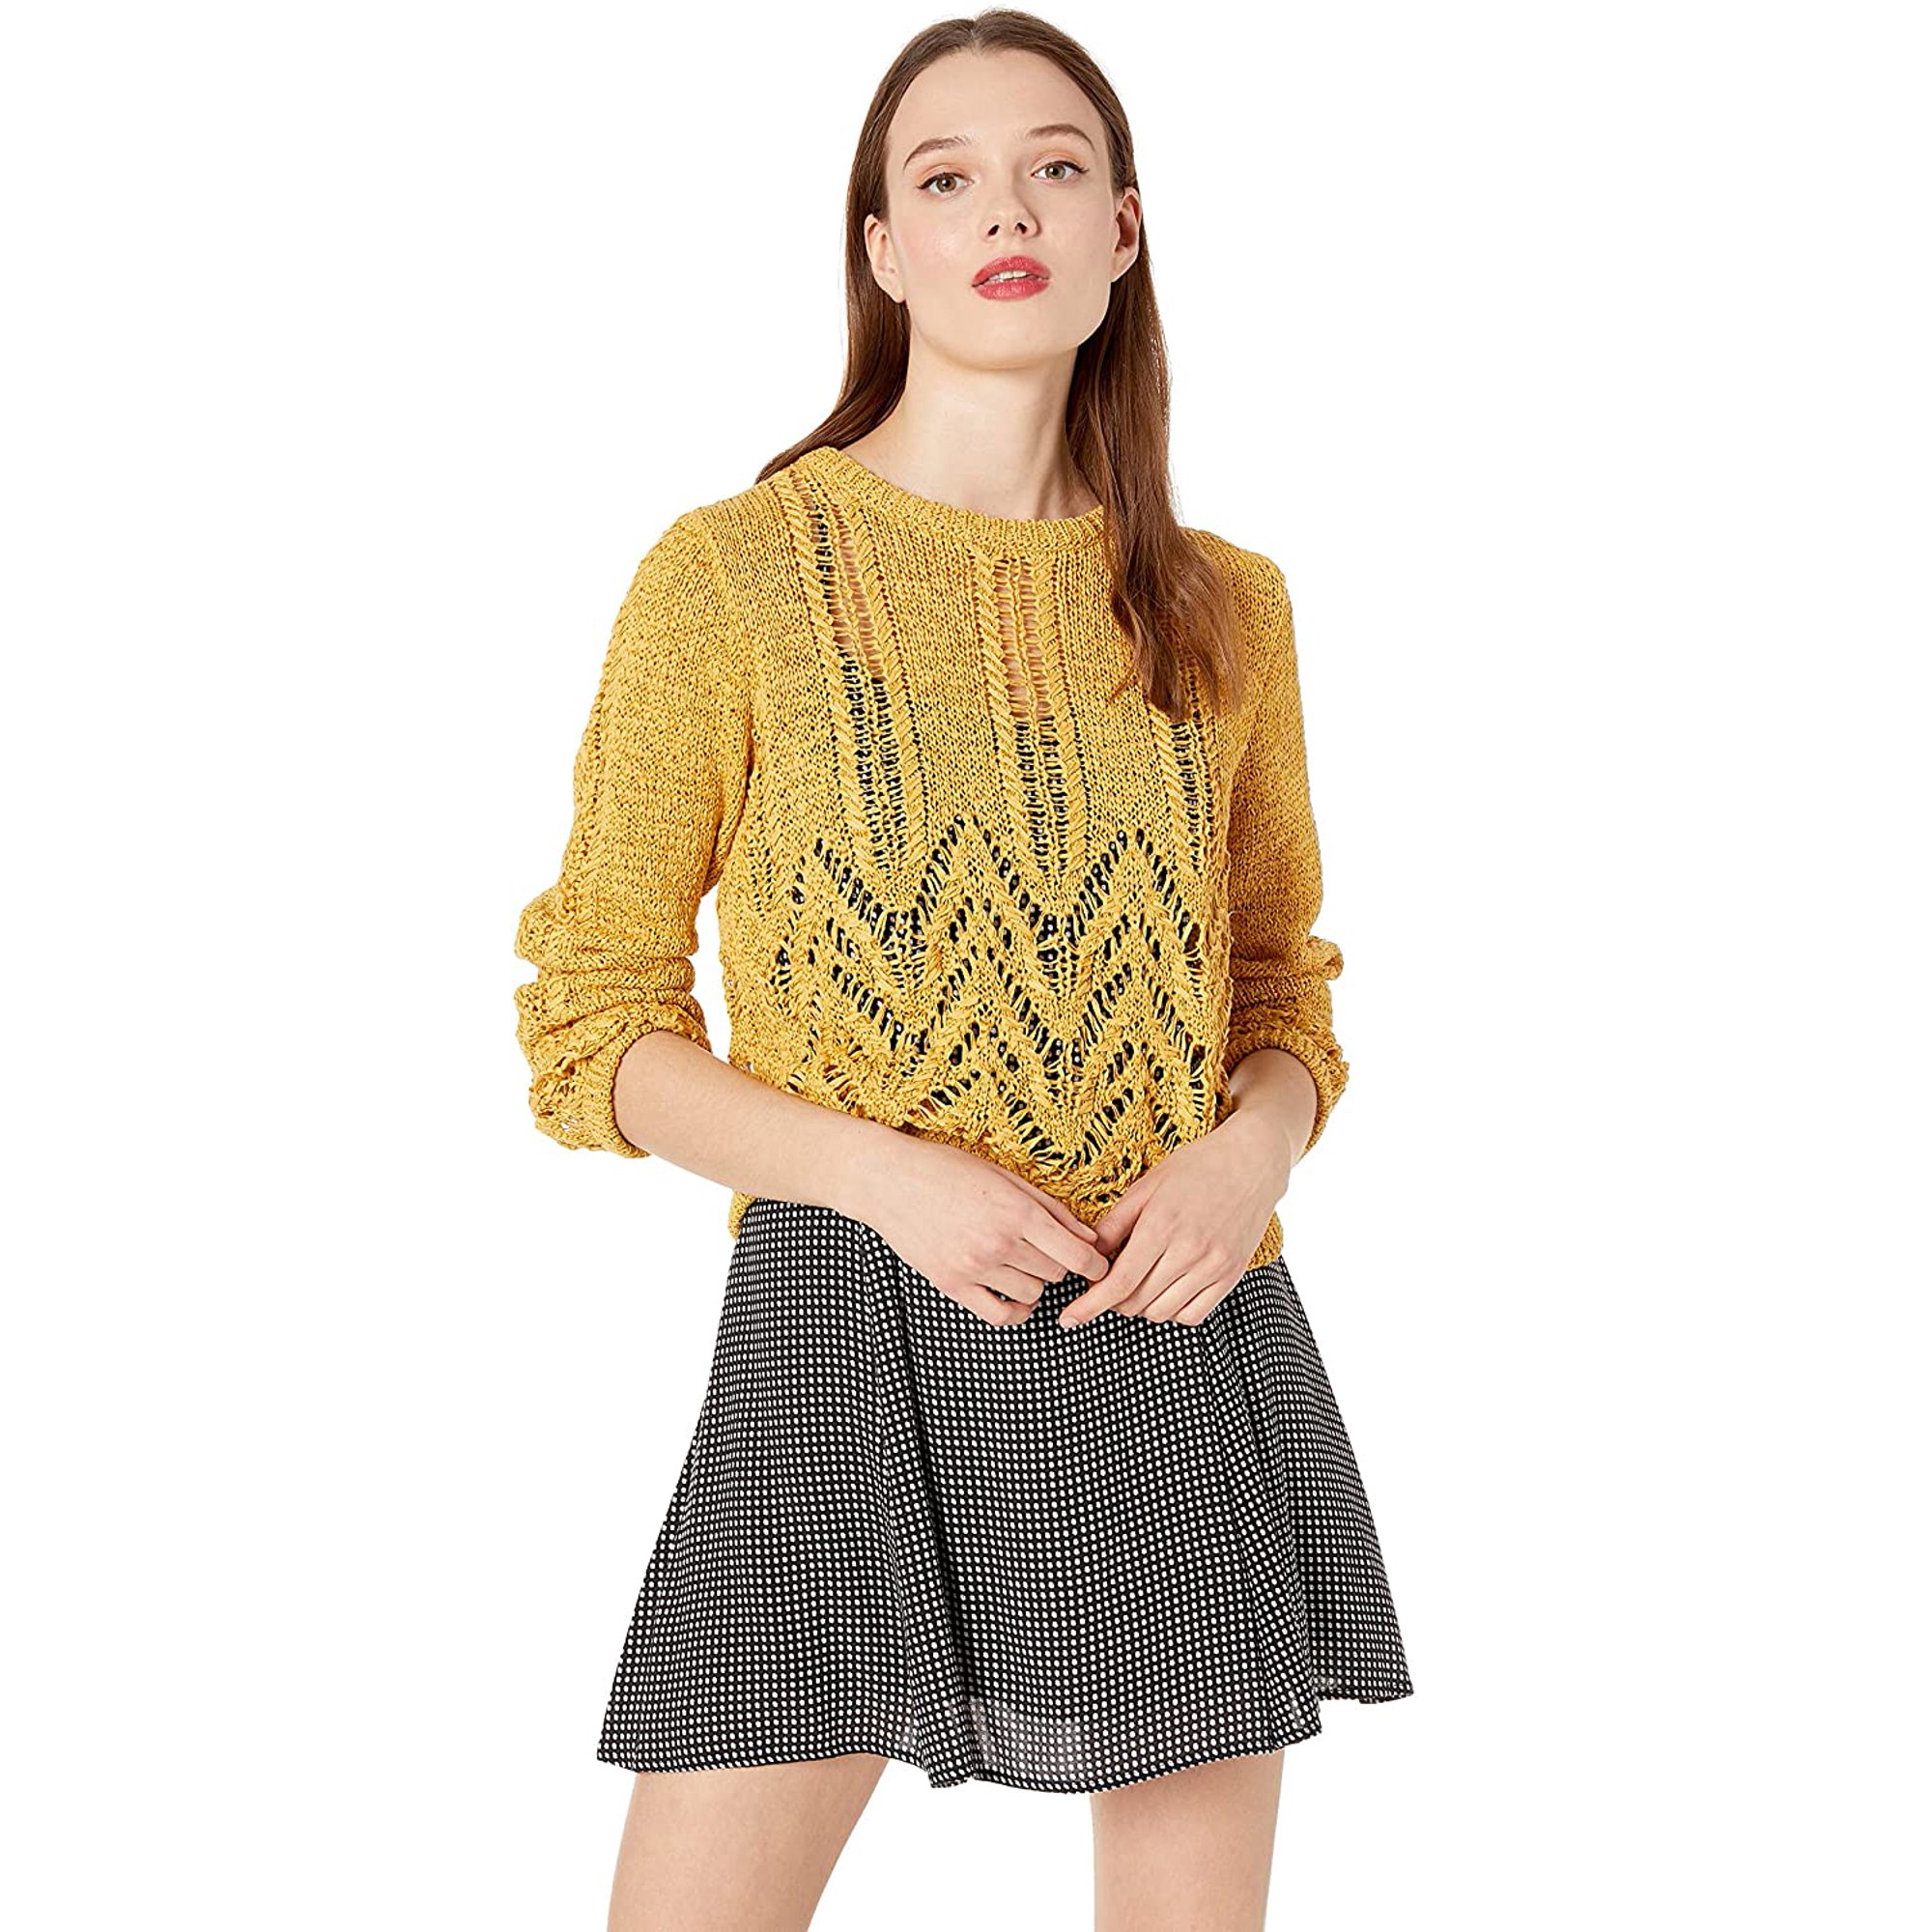 BCBGMAXAZRIA Women's Mixed Stitch Pullover Sweater, Golden Yellow, S